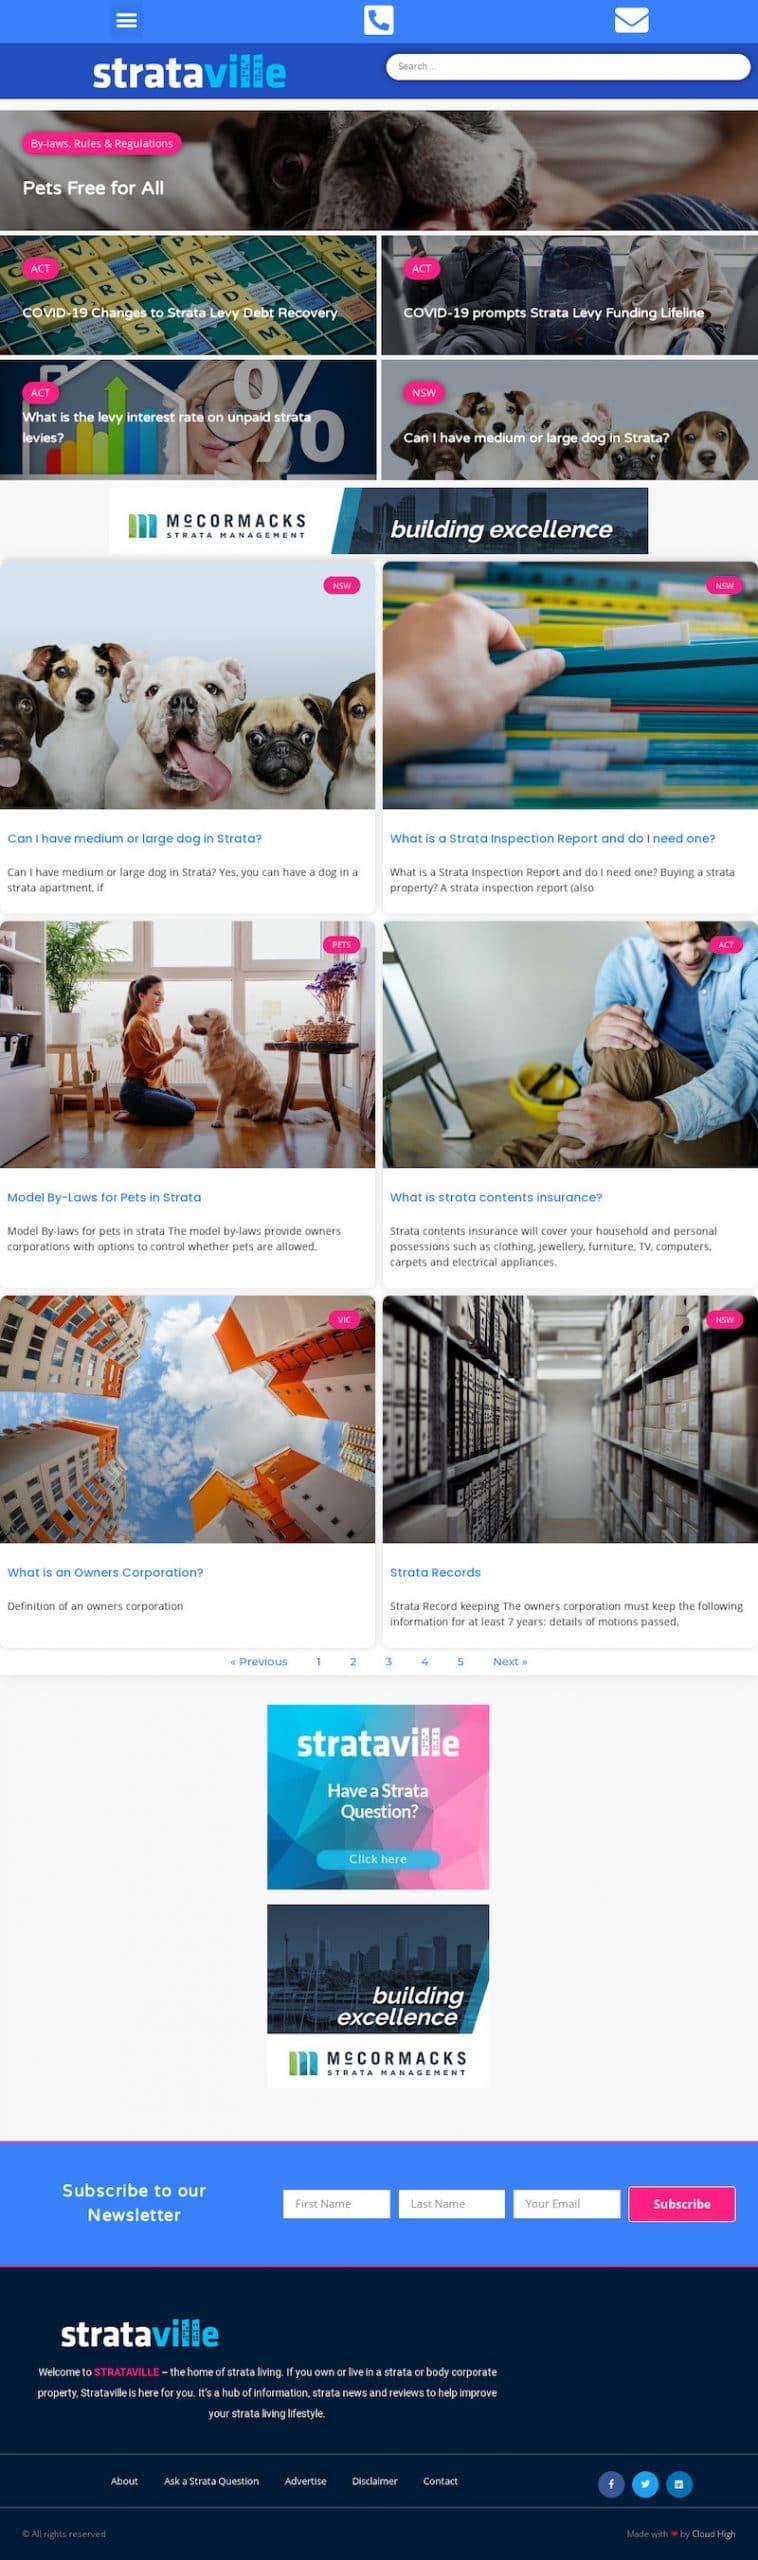 Strataville - WordPress Website Design Sydney - Cloud High